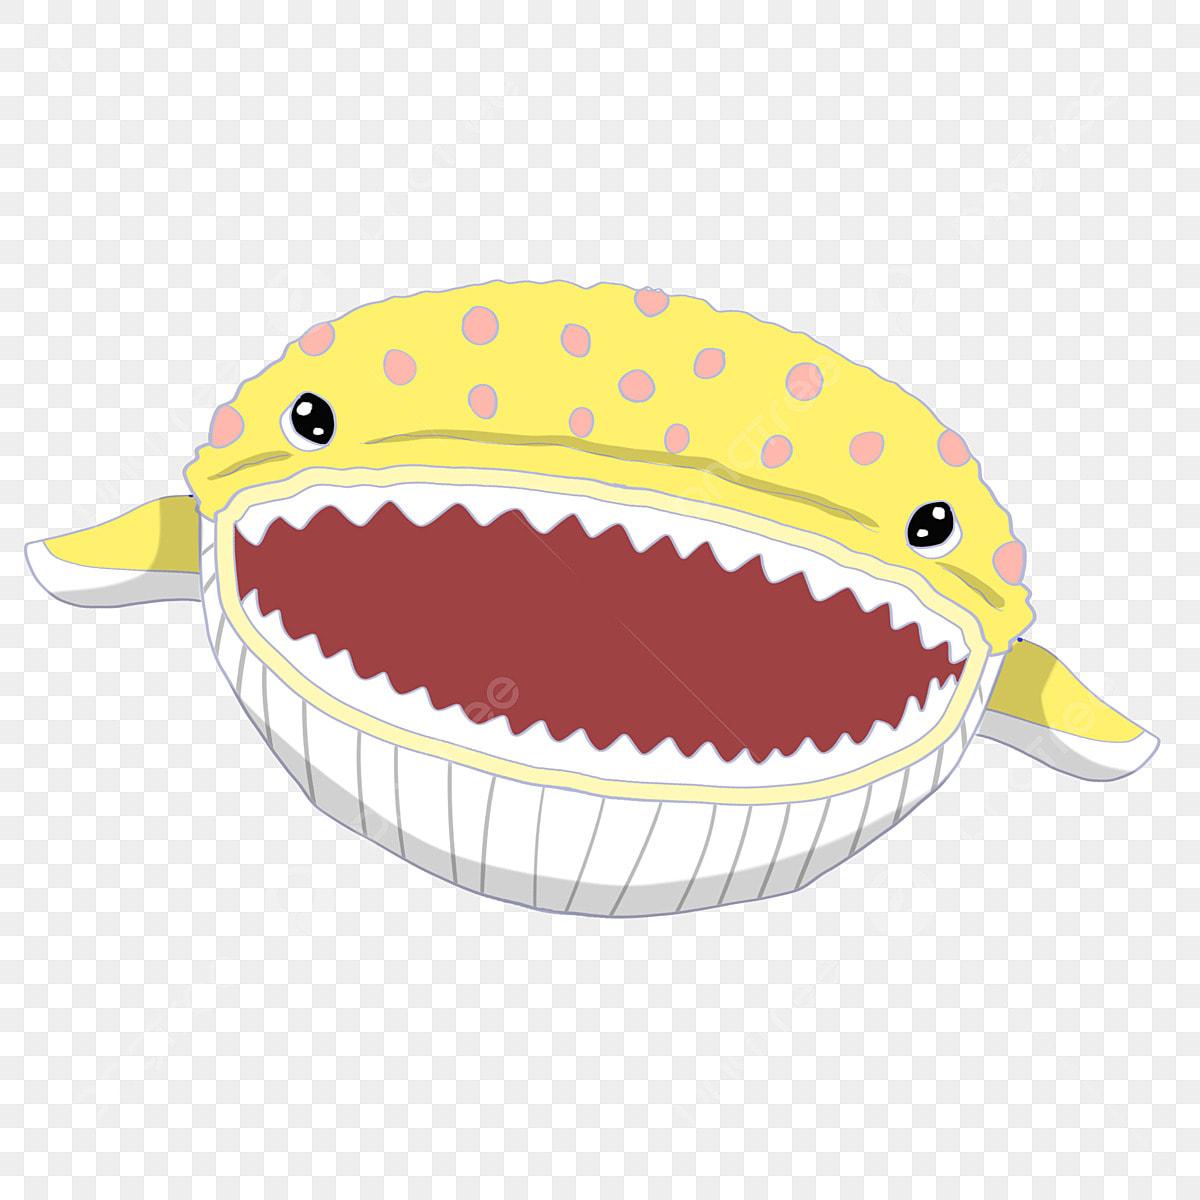 Big White Shark Mouth, Shark Clipart, Big White Shark, Tooth